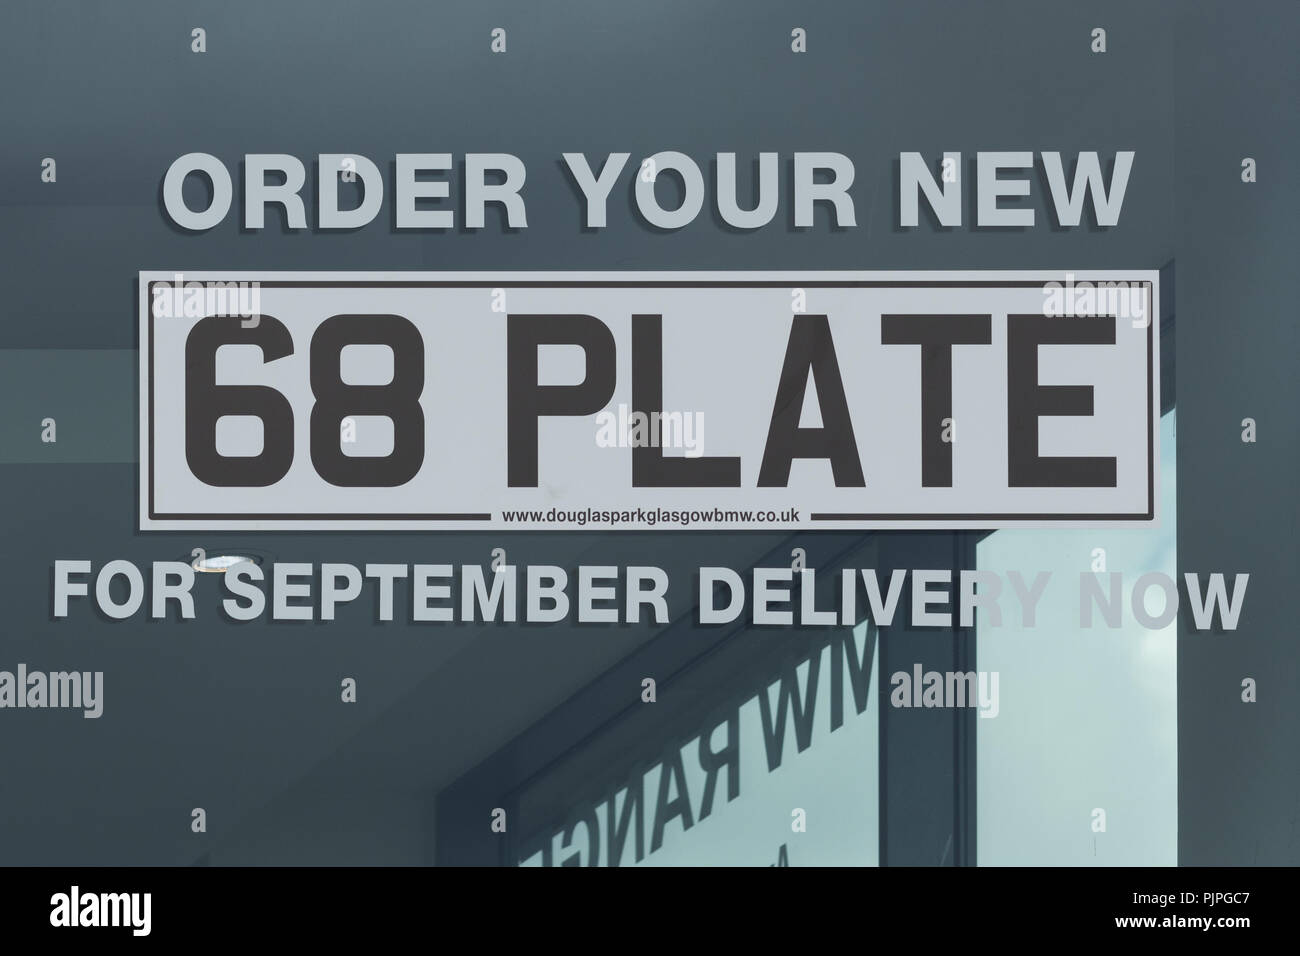 68 new car number plate advertising at car dealership uk - Stock Image